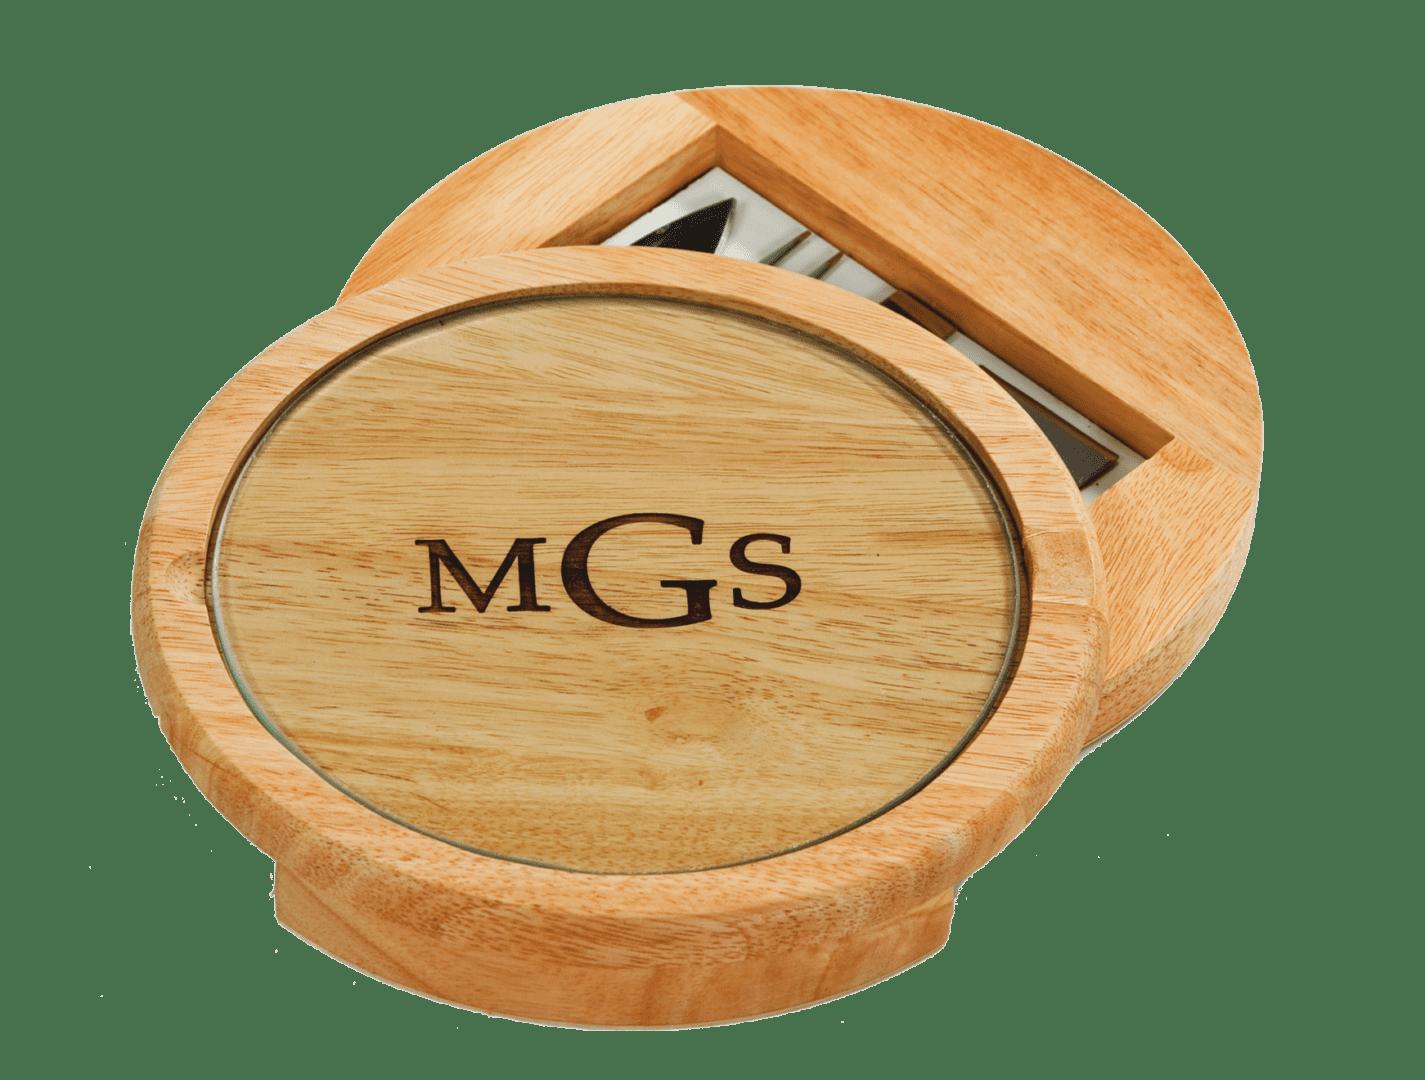 LASER ENGRAVE-M Monogram Wood